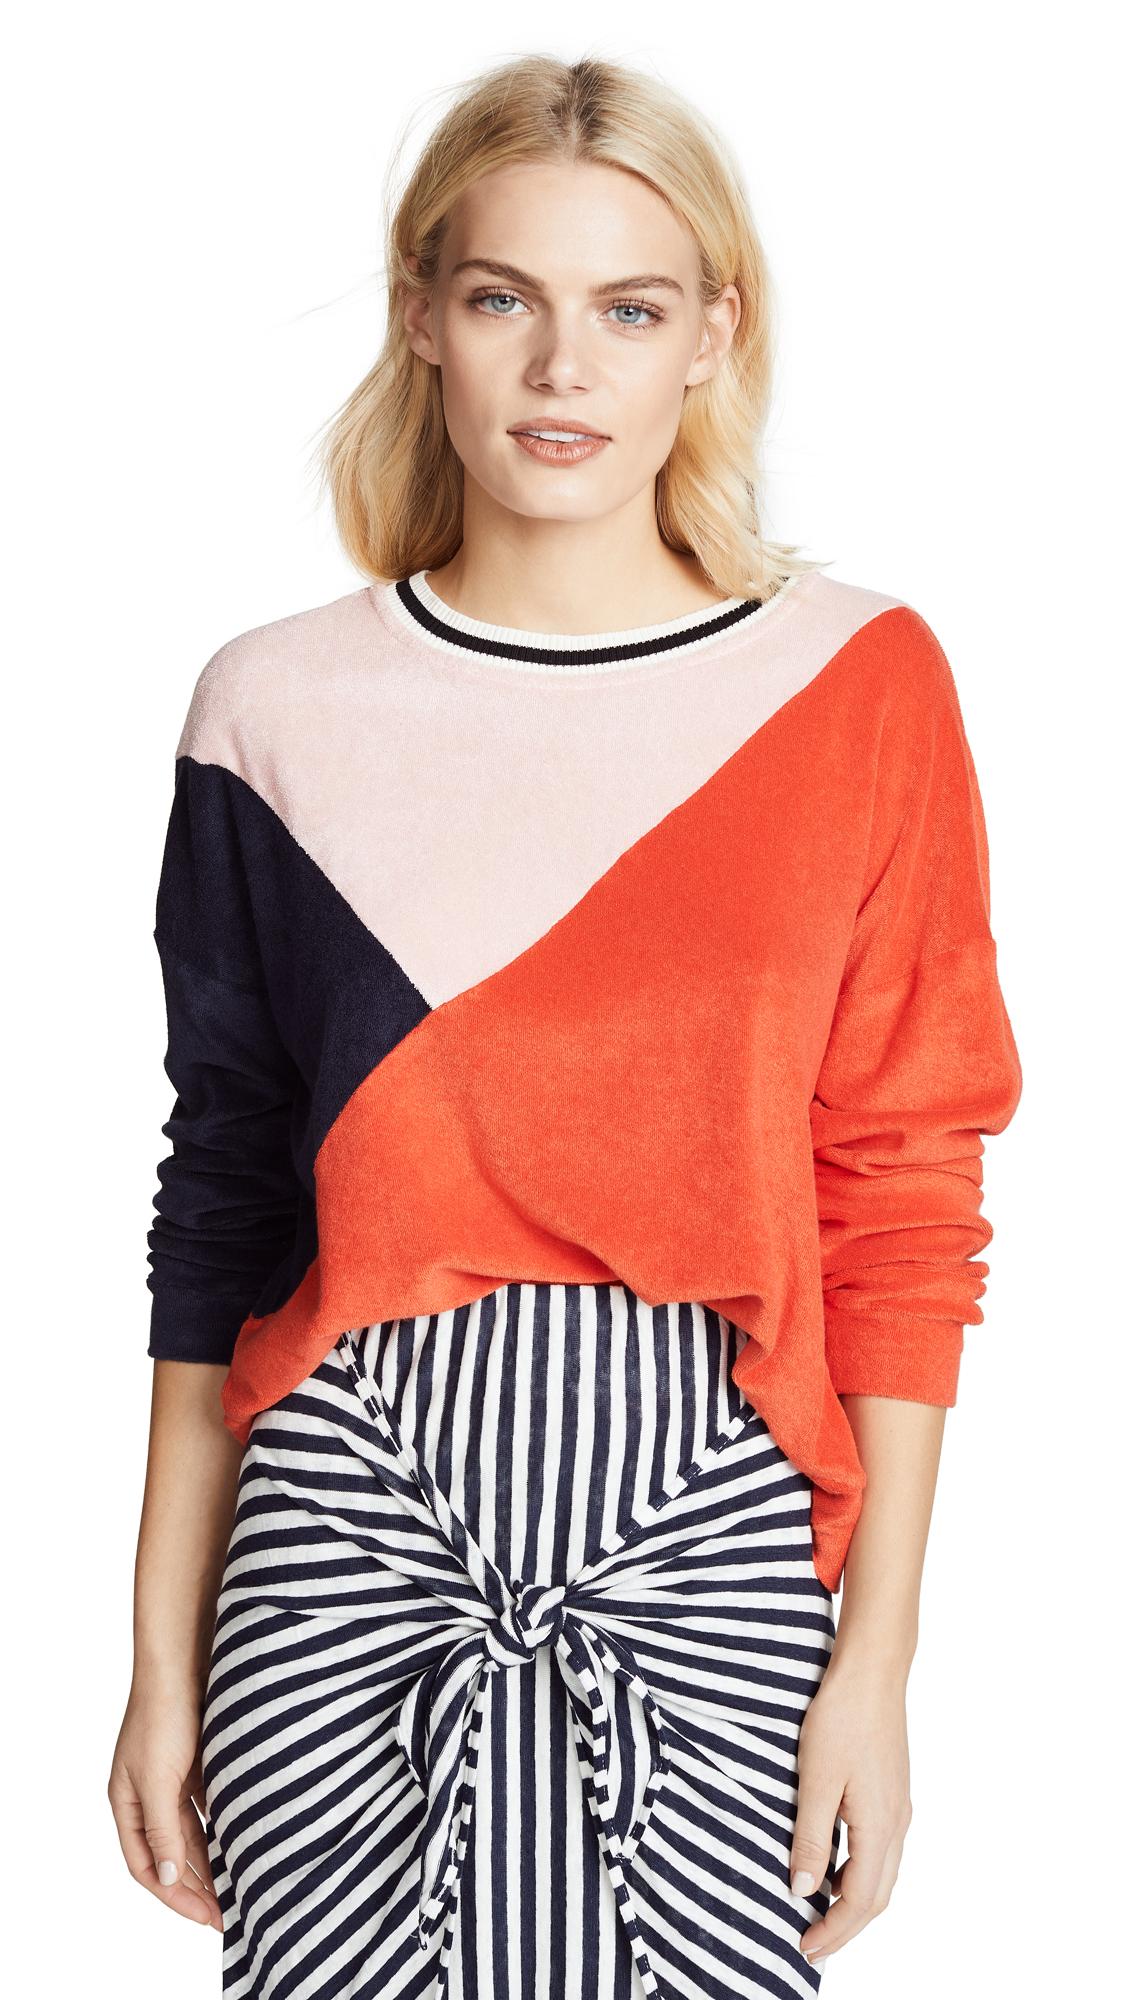 x MARGHERITA MISSONI Sportivo Sweatshirt in Red. - size M (also in L,S,XS) Splendid